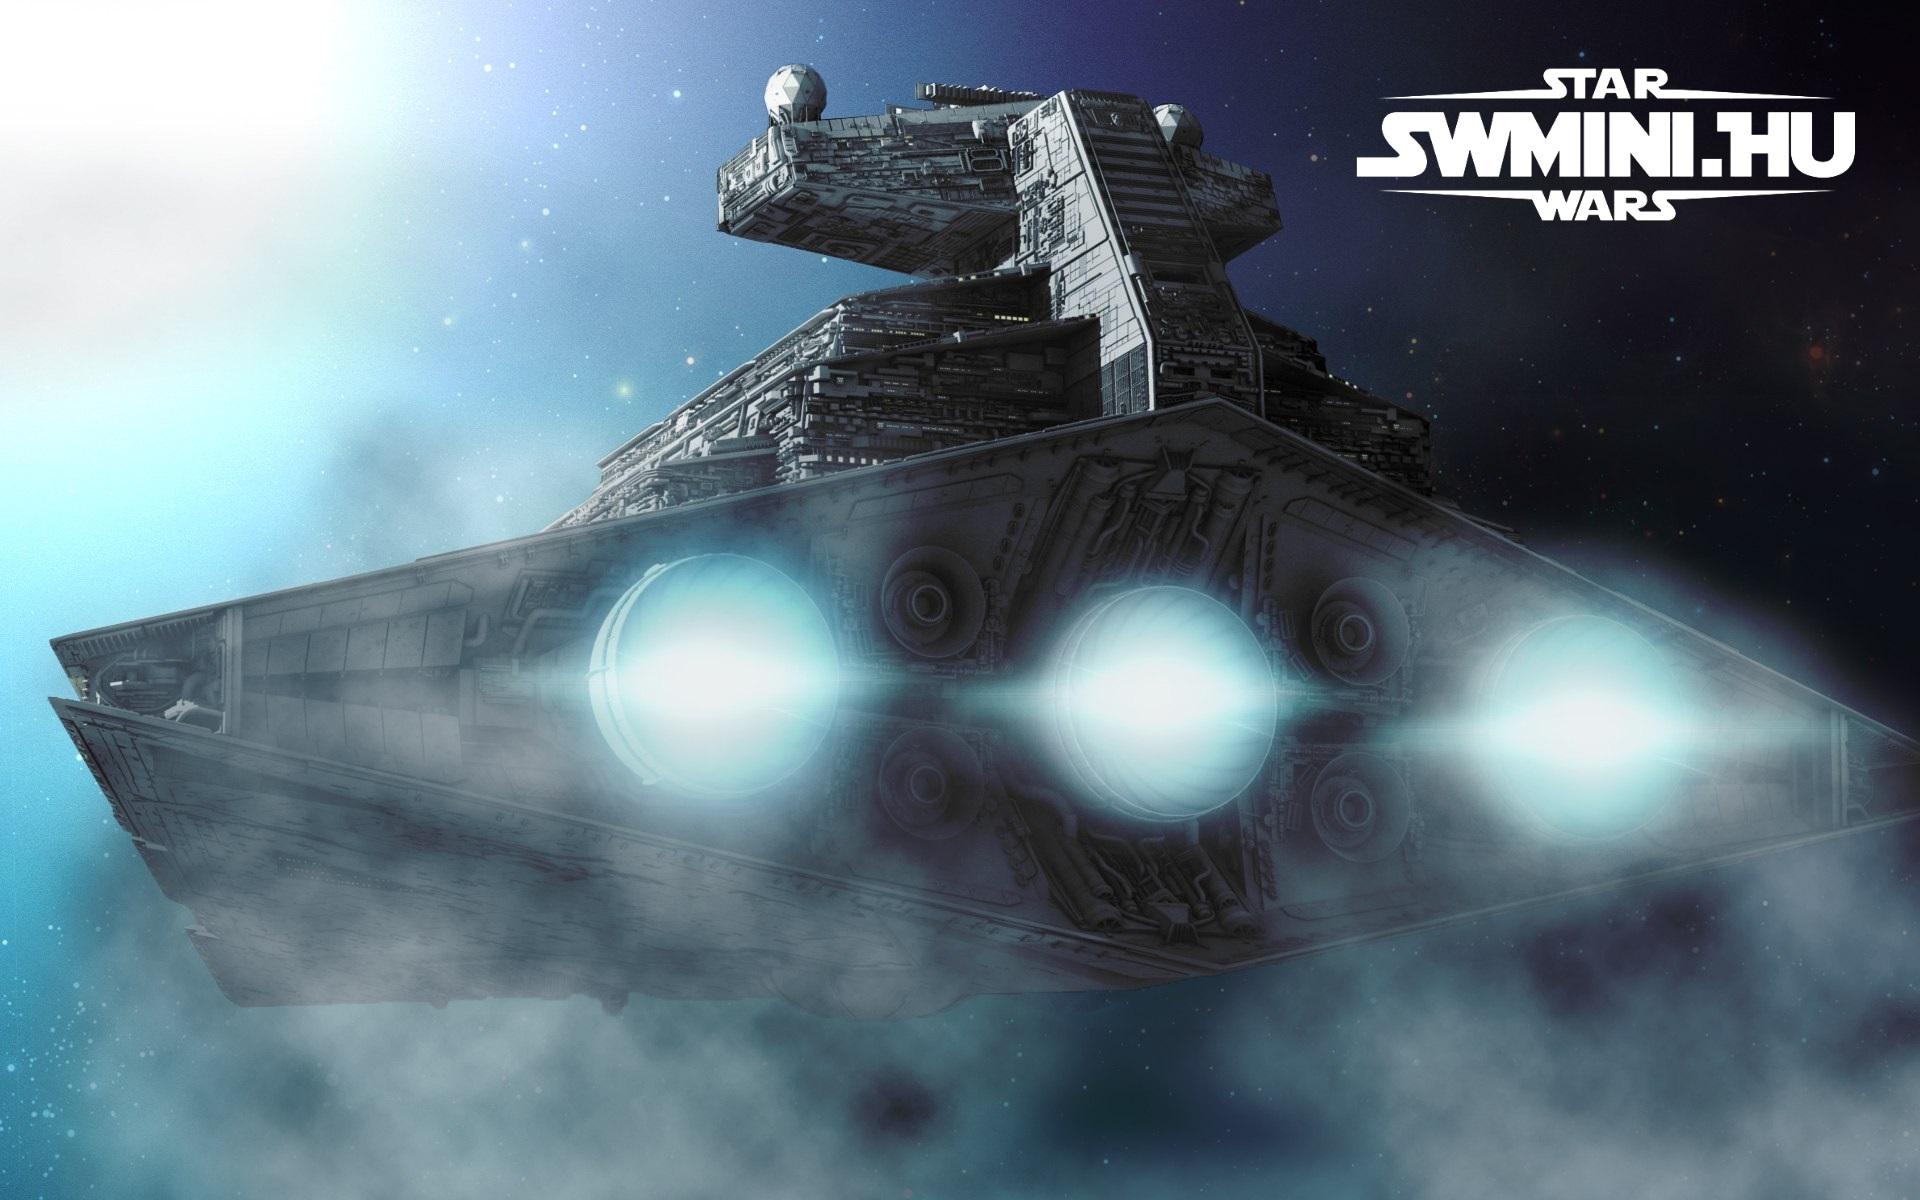 space-star-wars-star-destroyer-1920x1200_armada.jpg